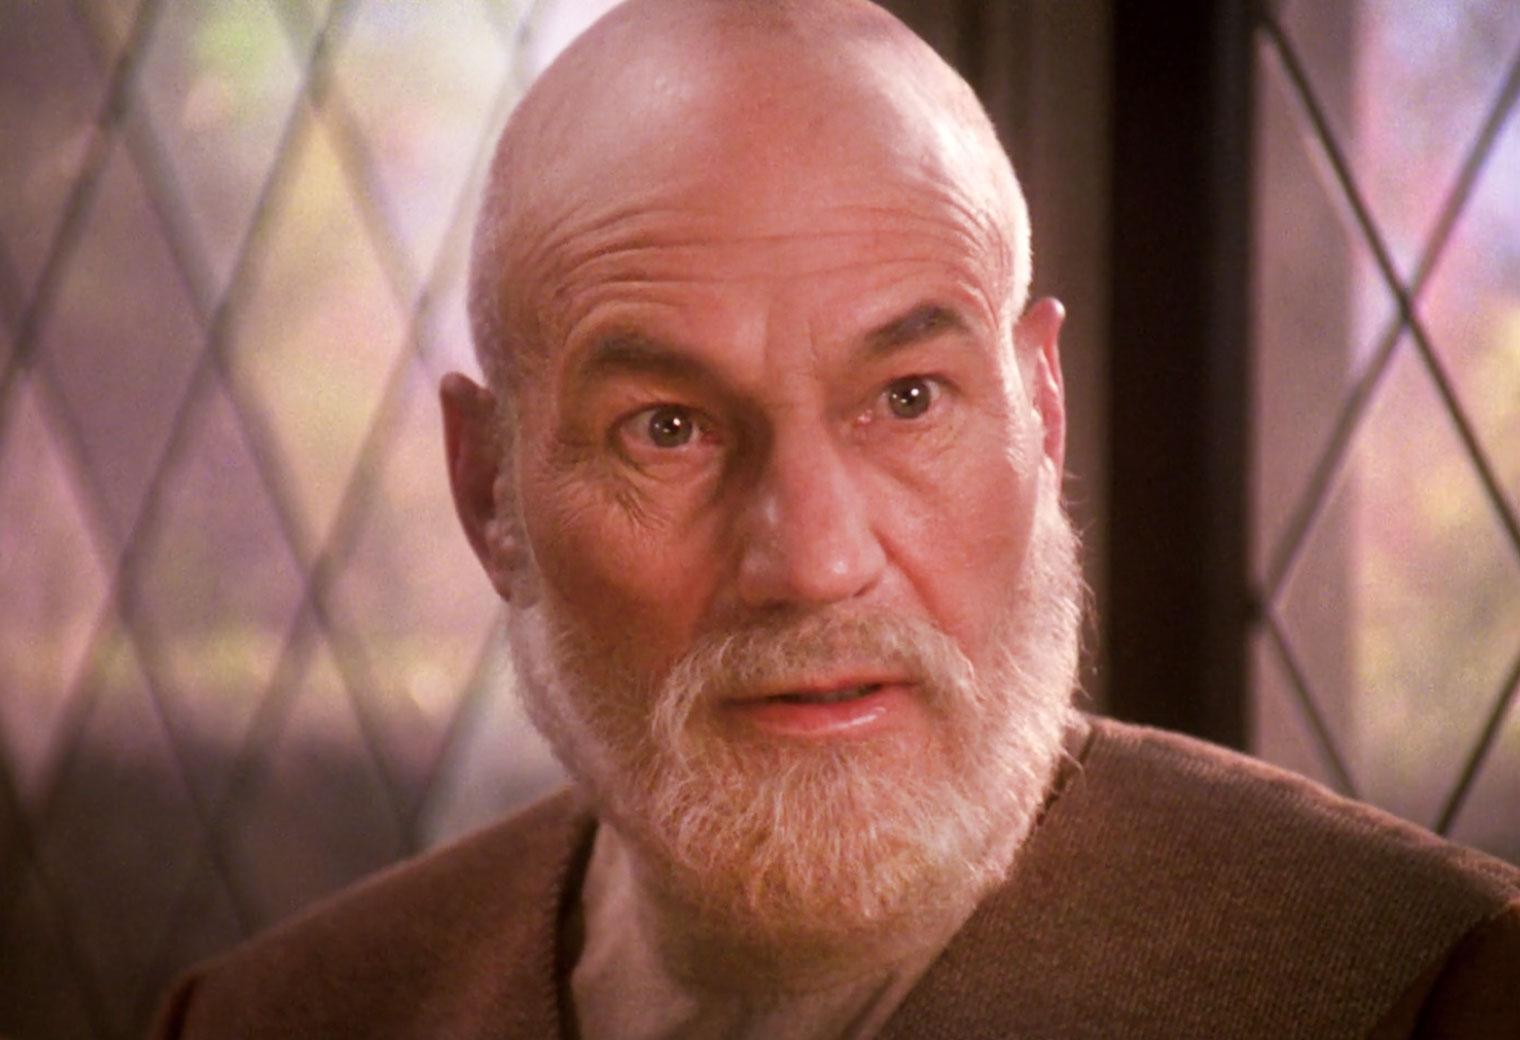 Picard Star Trek Series Production Begins, New Cast Members Announced